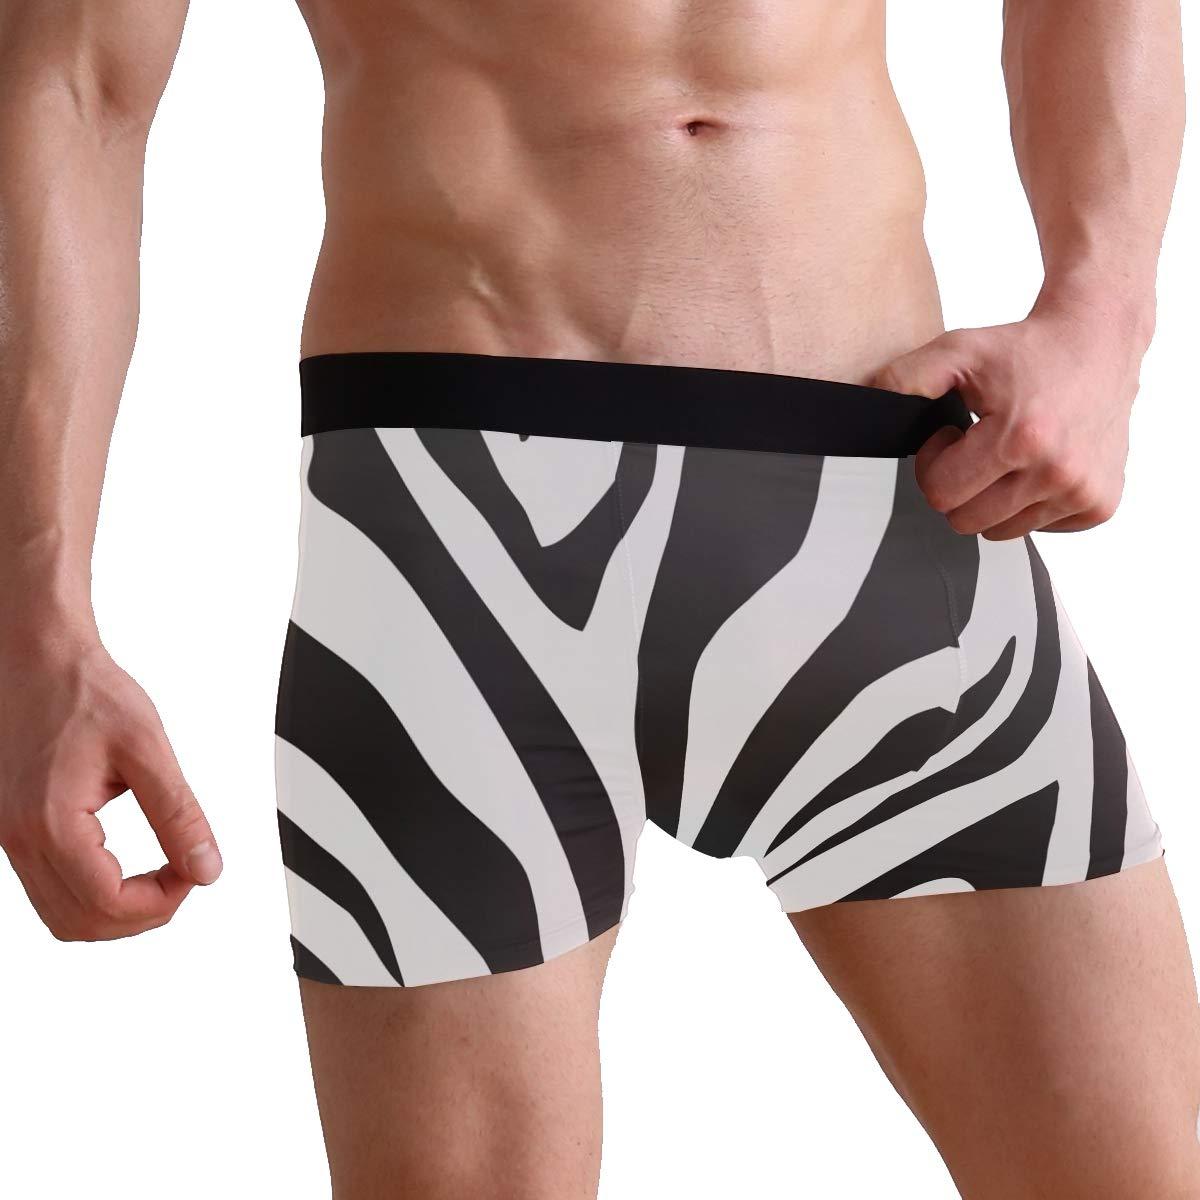 Josid Mens Swim Trunk Boxer Brief Swimsuit Beach Underwear Quick Dry Boardshorts,Black White Stripes Zebra Print